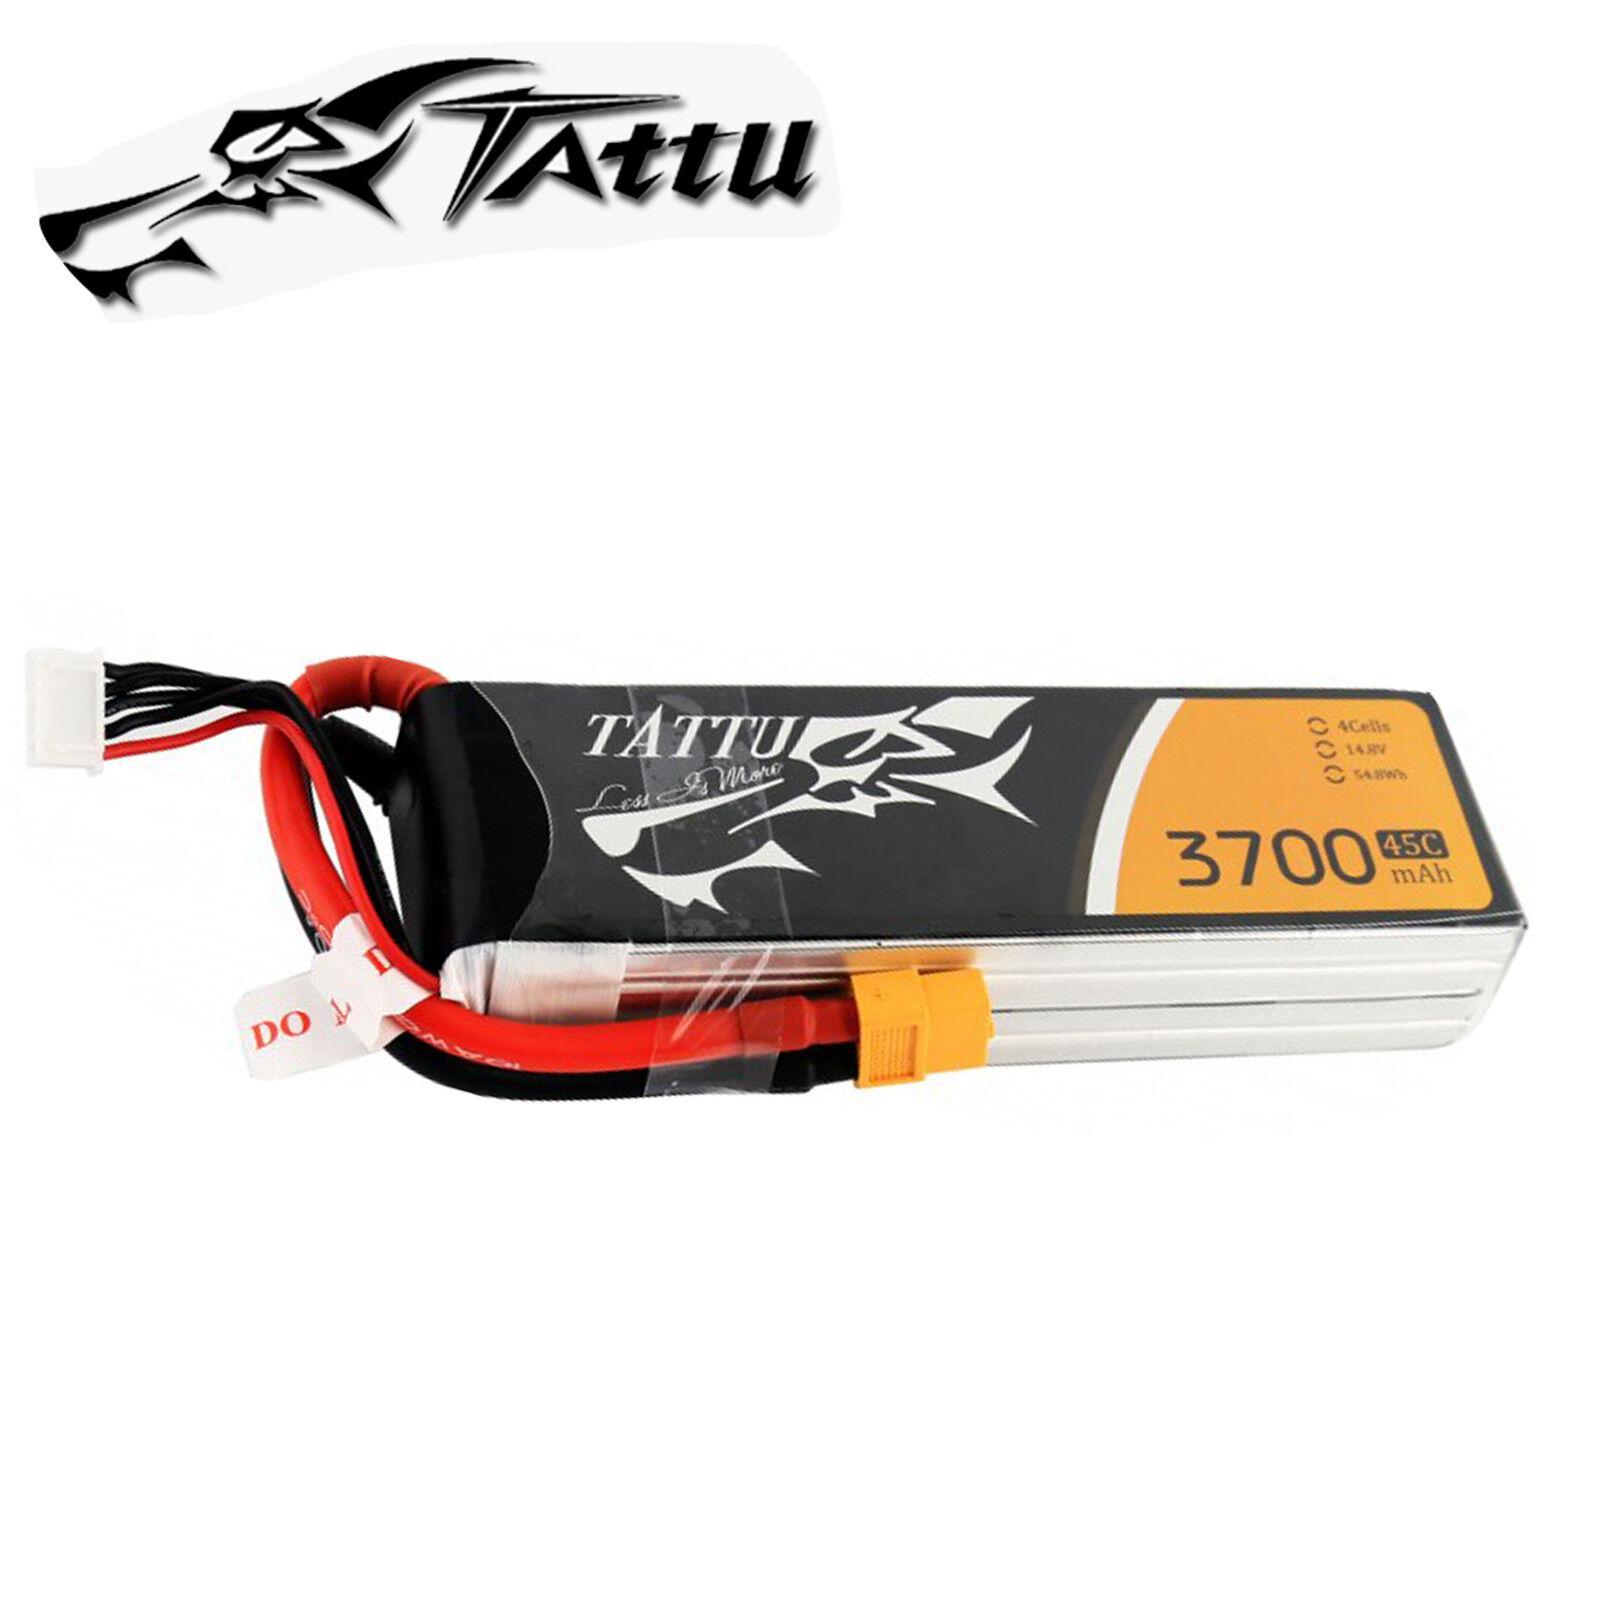 Tattu 3700mAh 14.8V 45C 4S Batería Lipo XT60 Enchufe para FPV Racing Quad Drone Heli